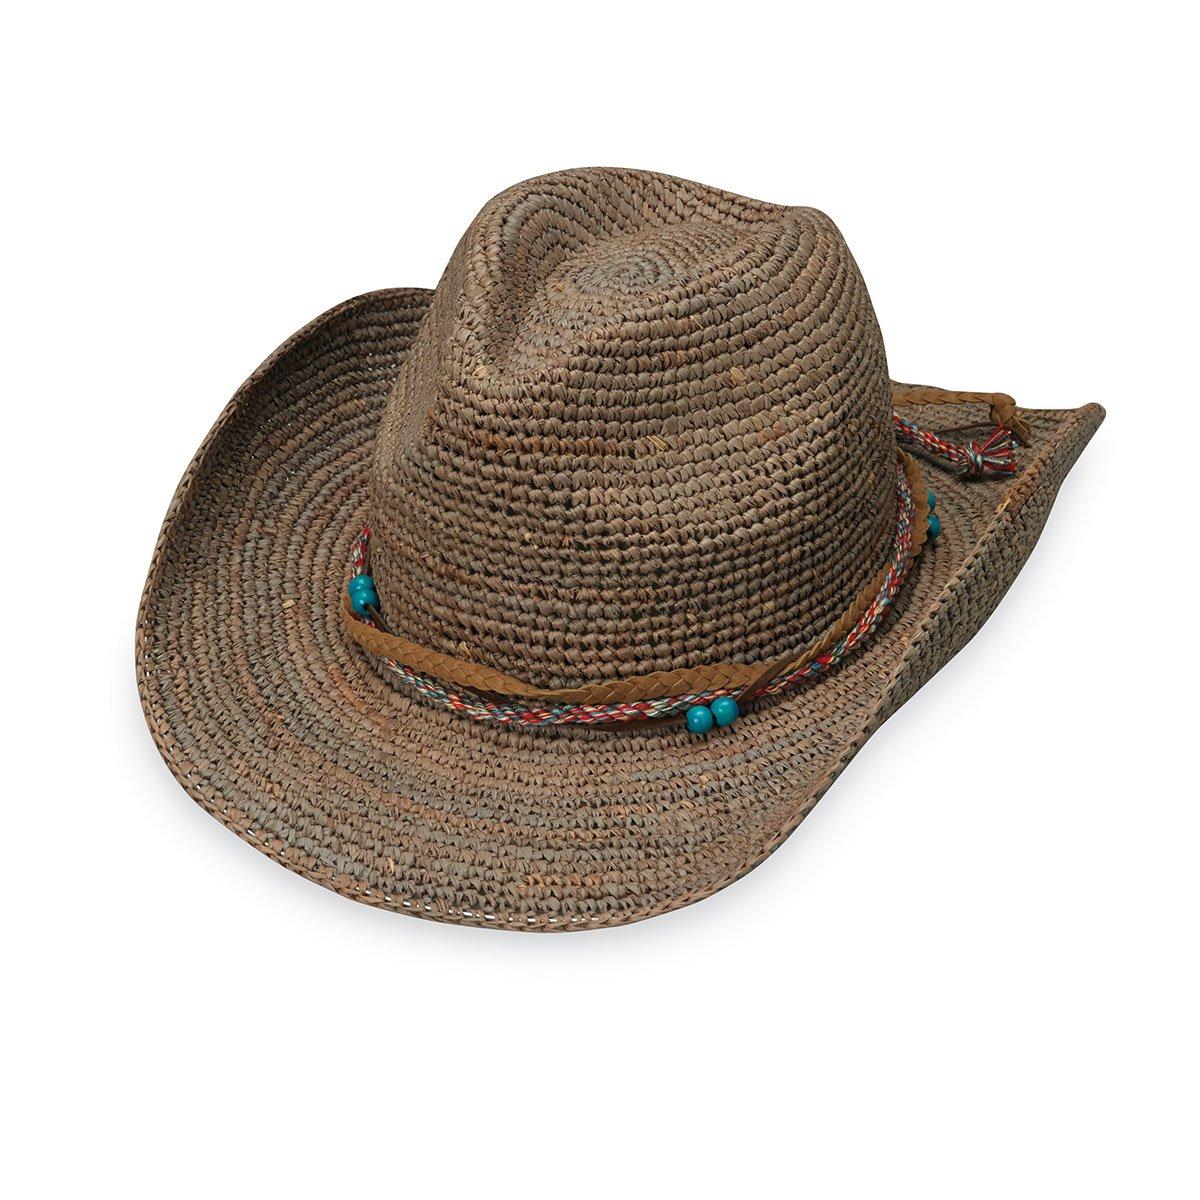 Catalina Cowboy Sun Hats Cowboy Hats Wallaroo